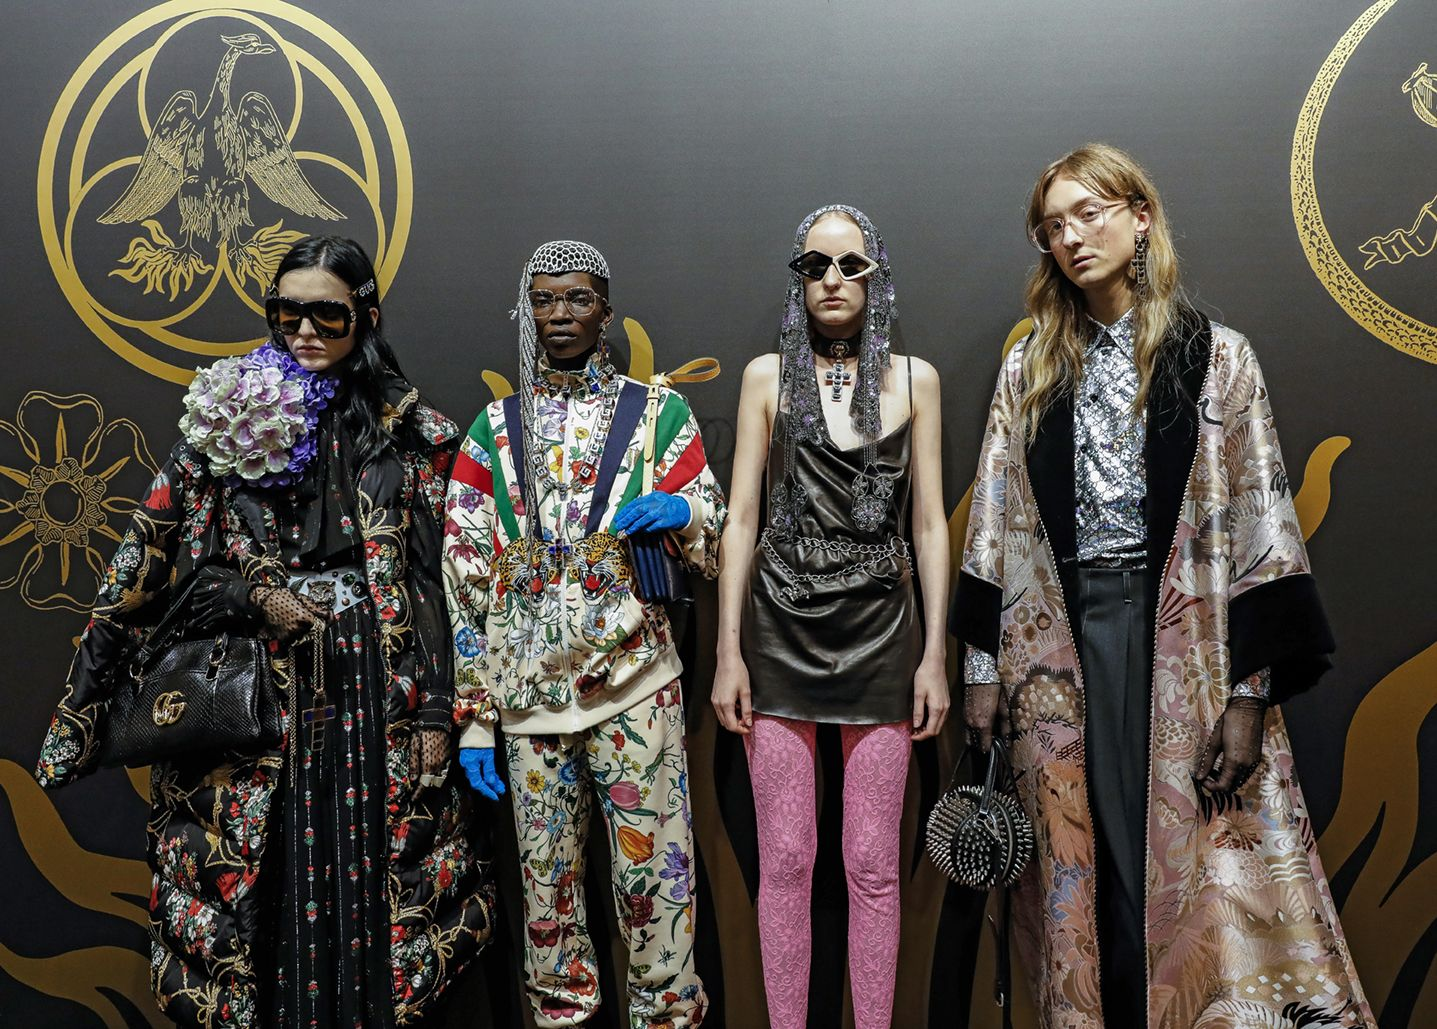 749c728d48 Rave in a Cemetery | The Alternative View | Fashion, Gucci, Gucci ...